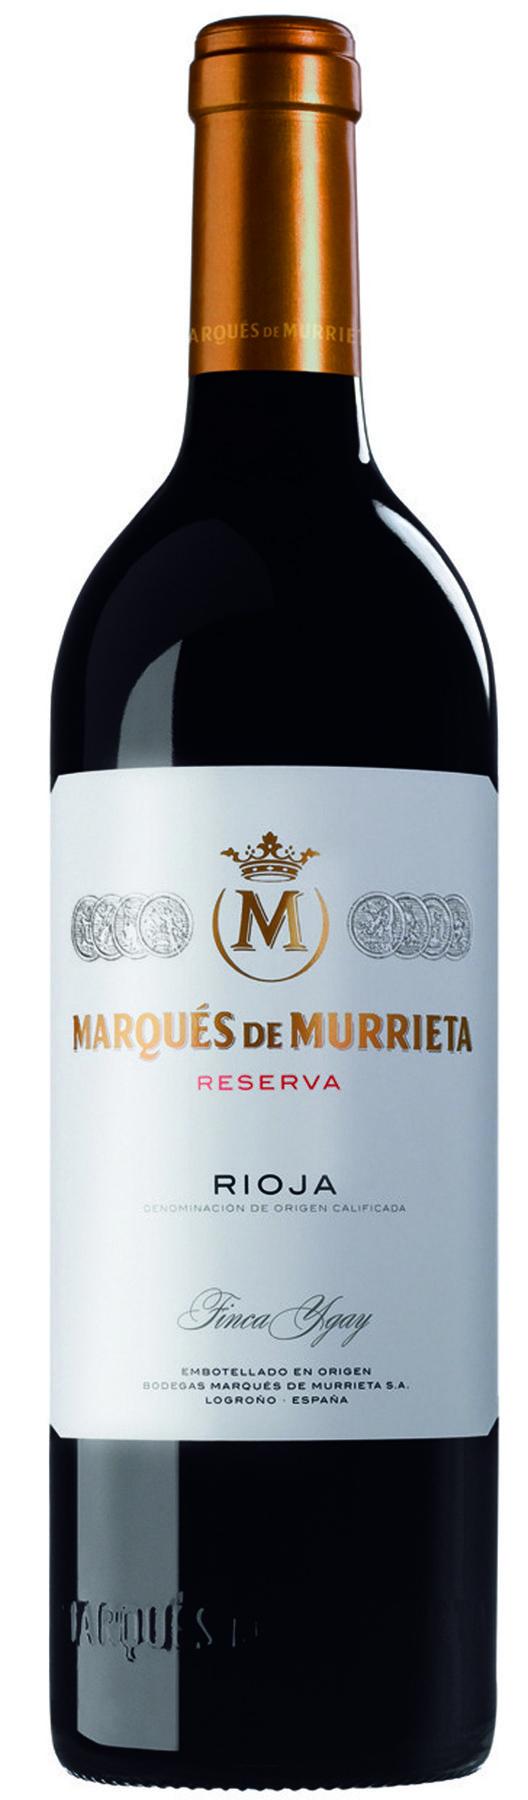 Marqués De Murrieta Reserva - Bodegas Marques de Murrieta - La Rioja, Spain